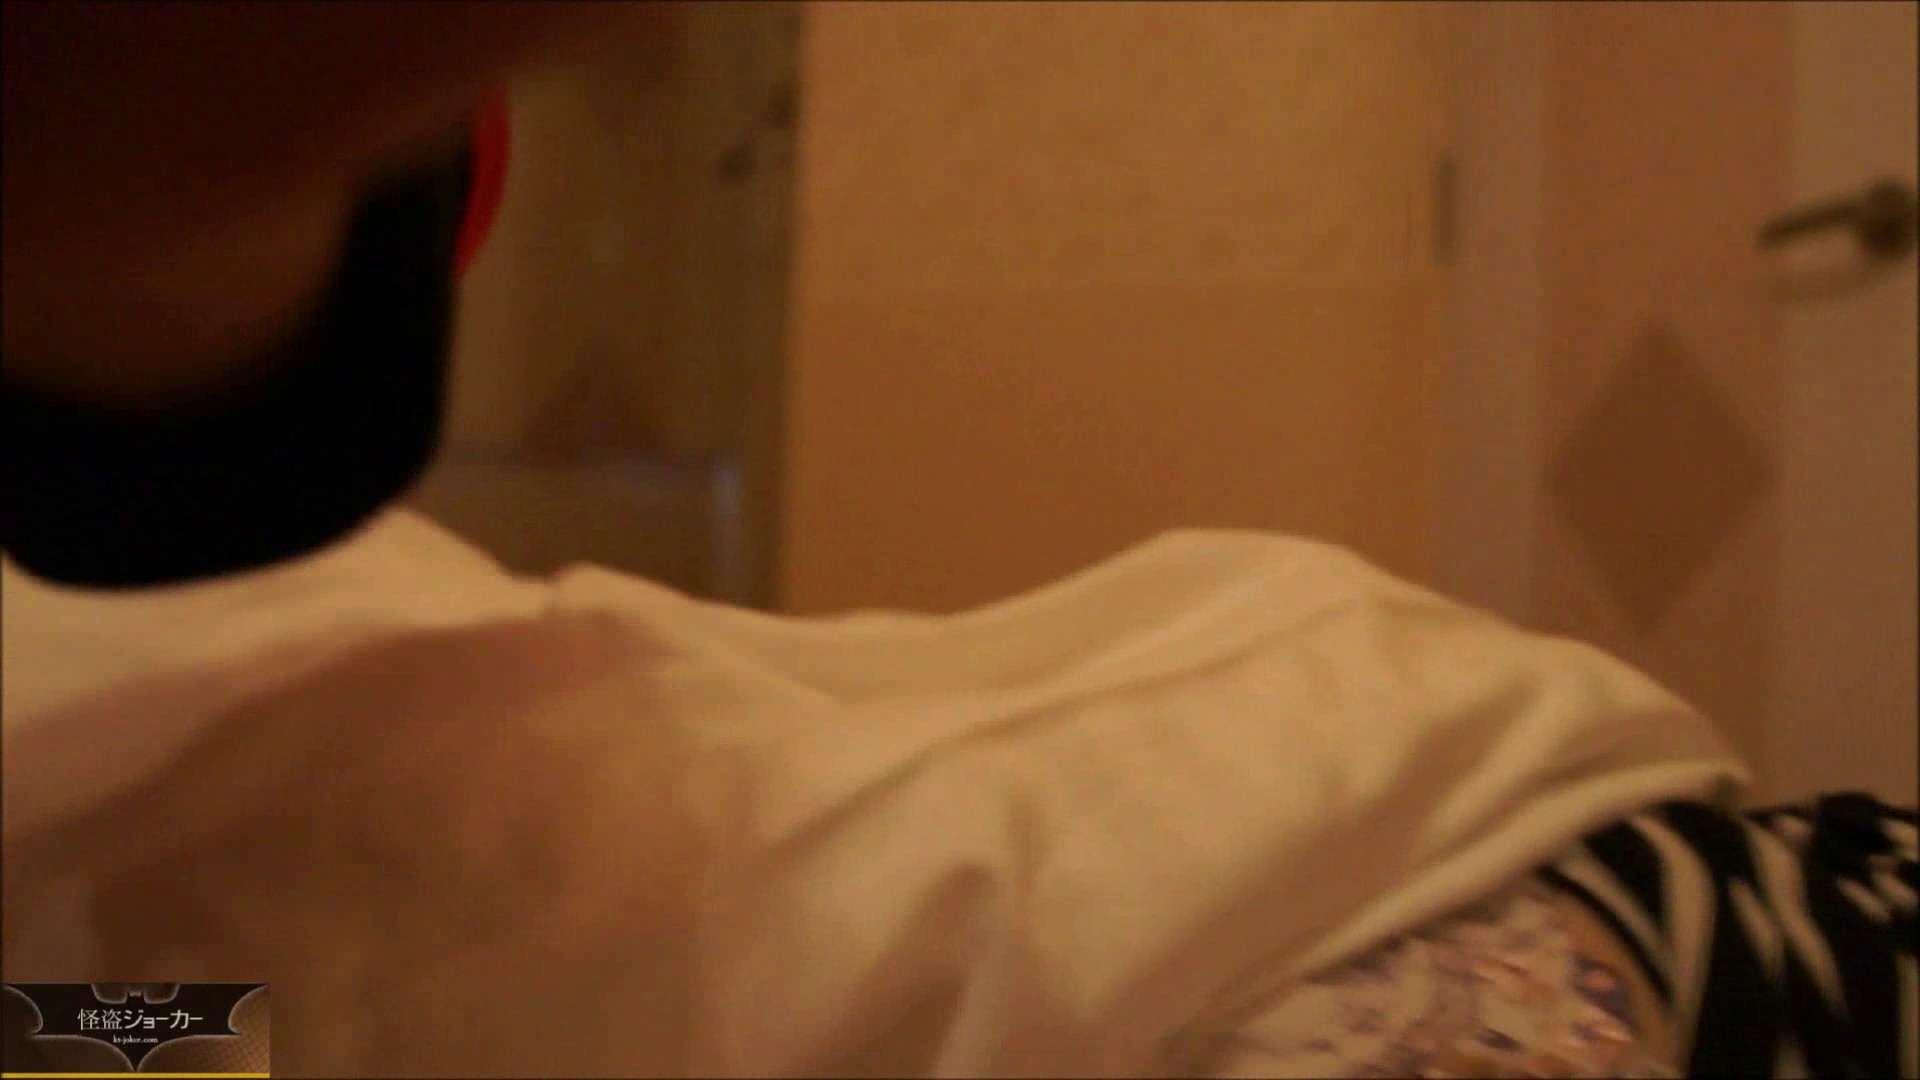 vol.4【白衣の天使23歳】☆のりこちゃん☆ホテルお持ち帰り。朦朧のまま感じて 美肌  109画像 78